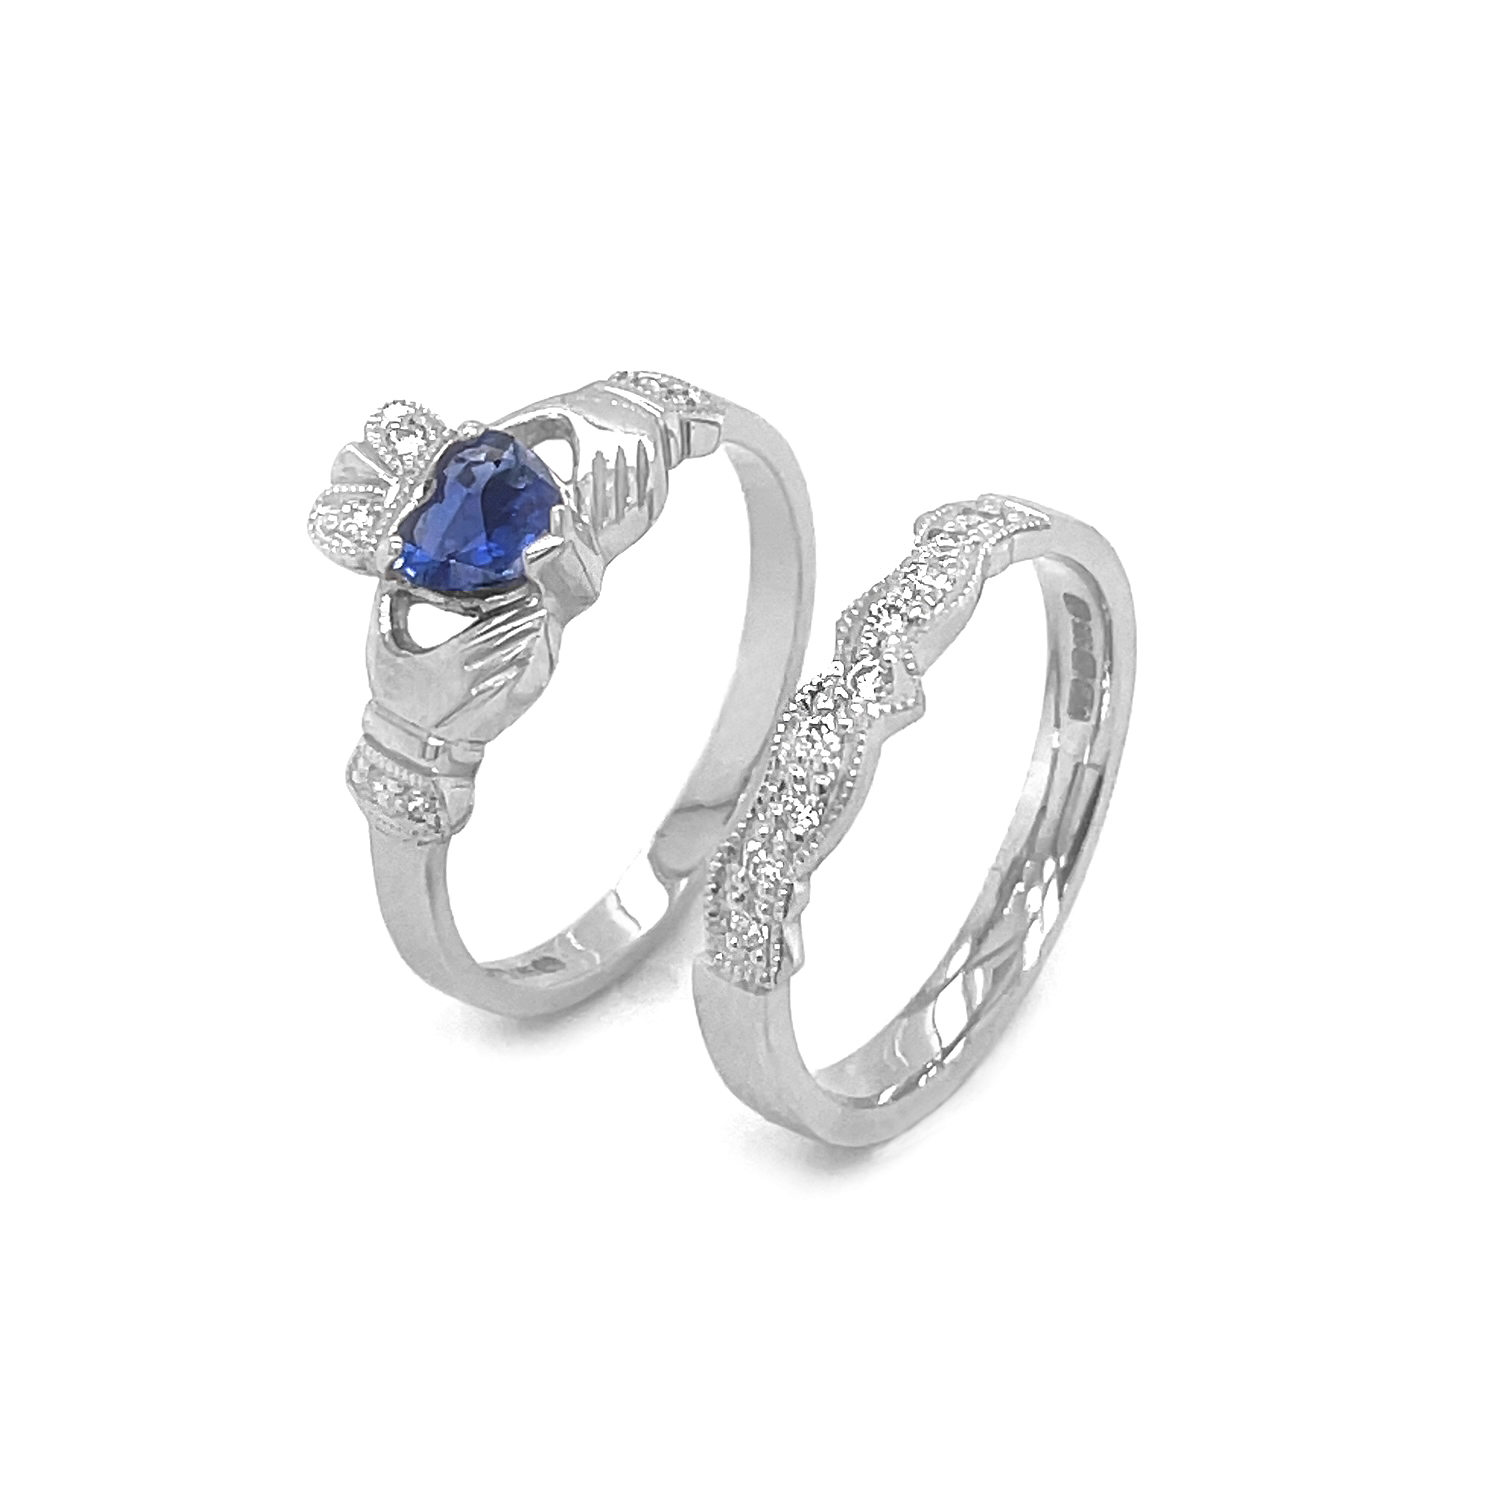 White Gold Heartshape Emerald & Diamond Claddagh Ring Set